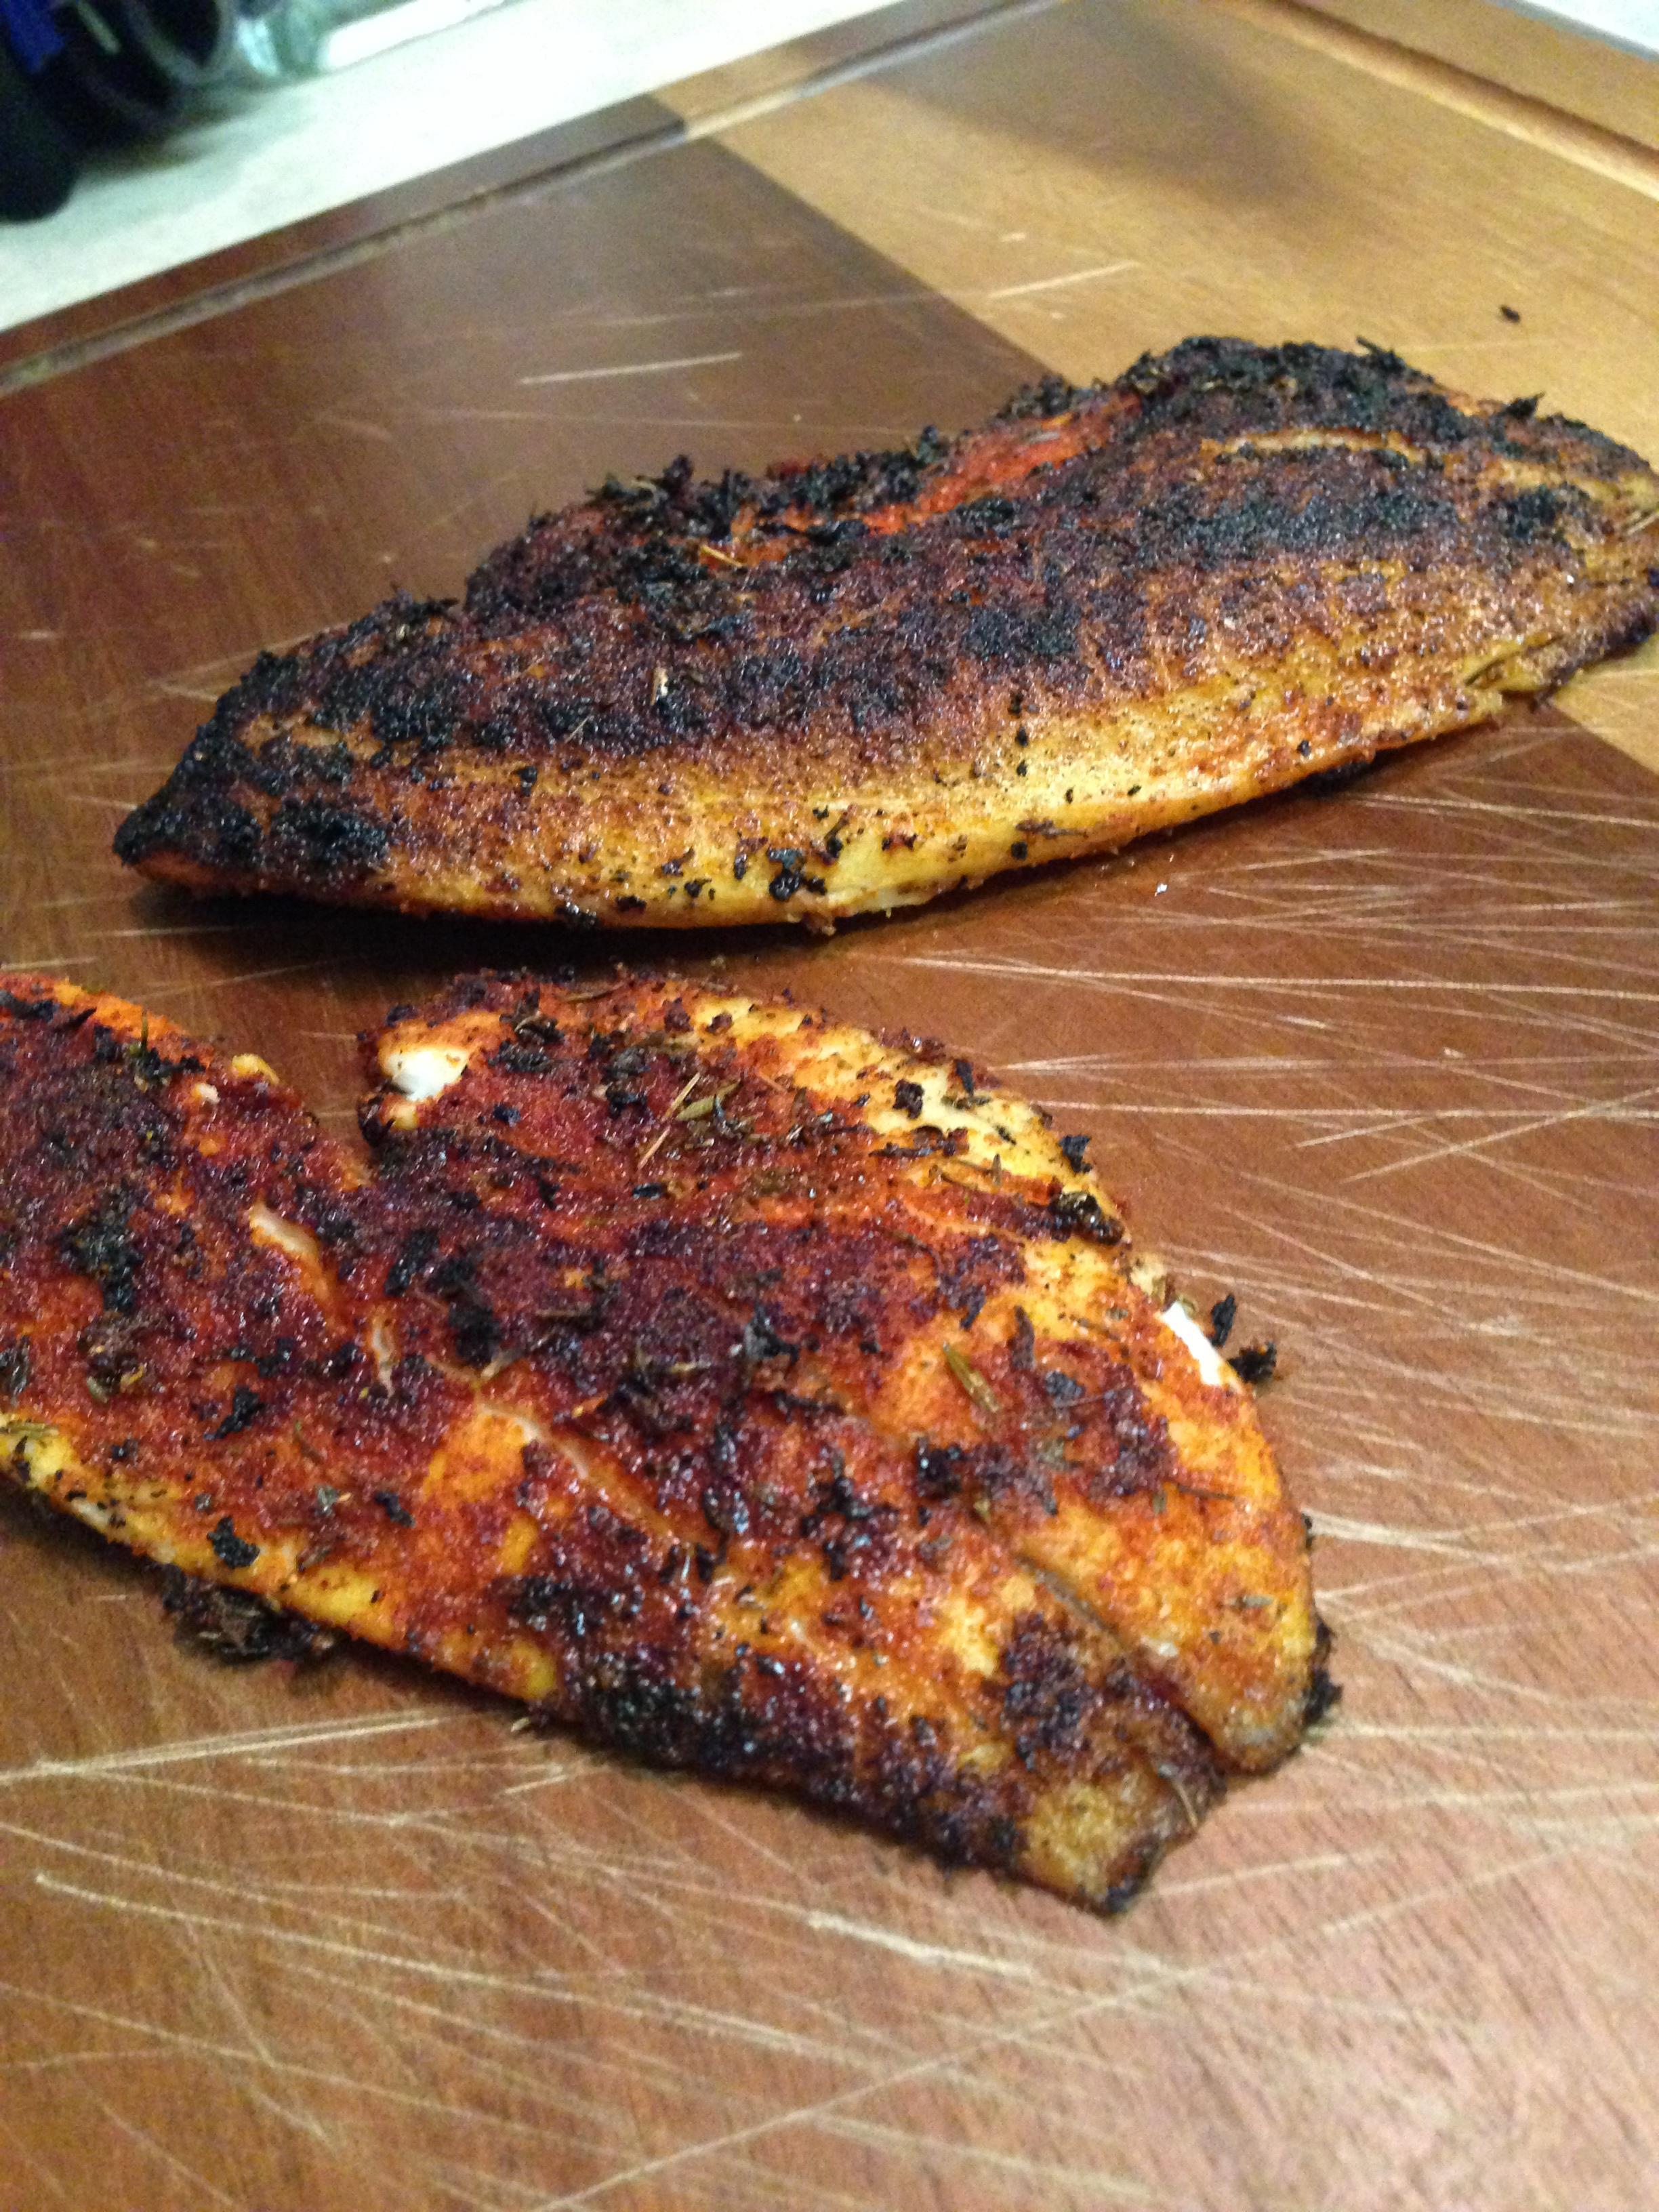 Blackening seasoning fish food is love made edible for Blackening spice for fish